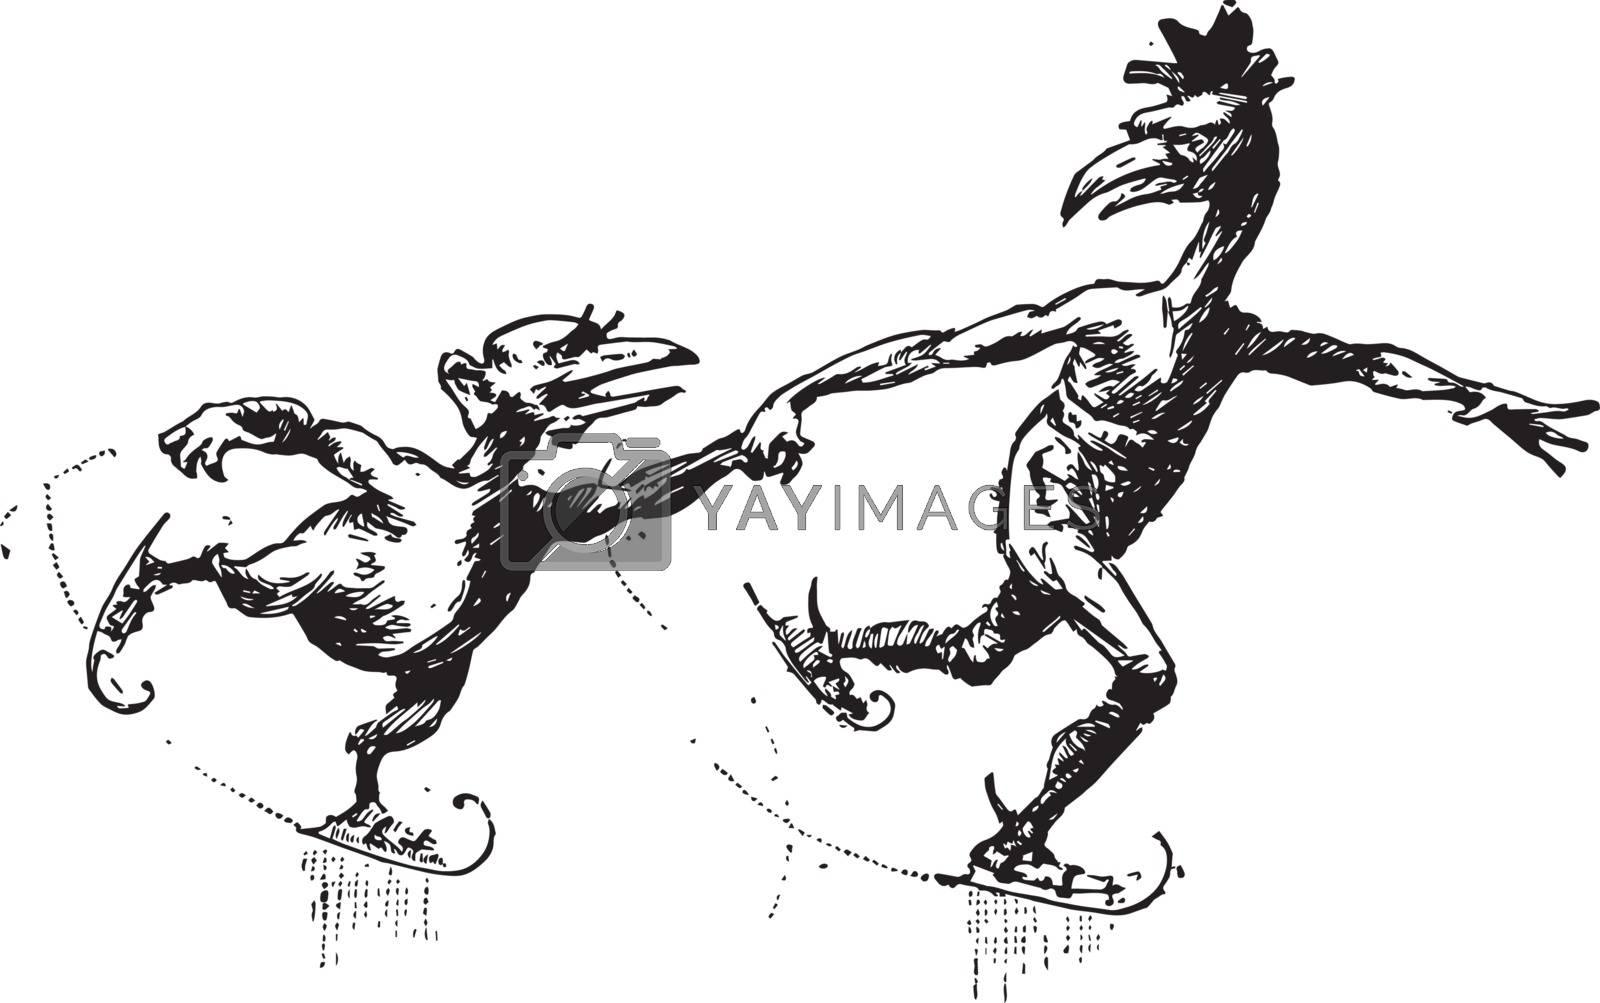 Thirteen Boys, vintage illustration by Morphart